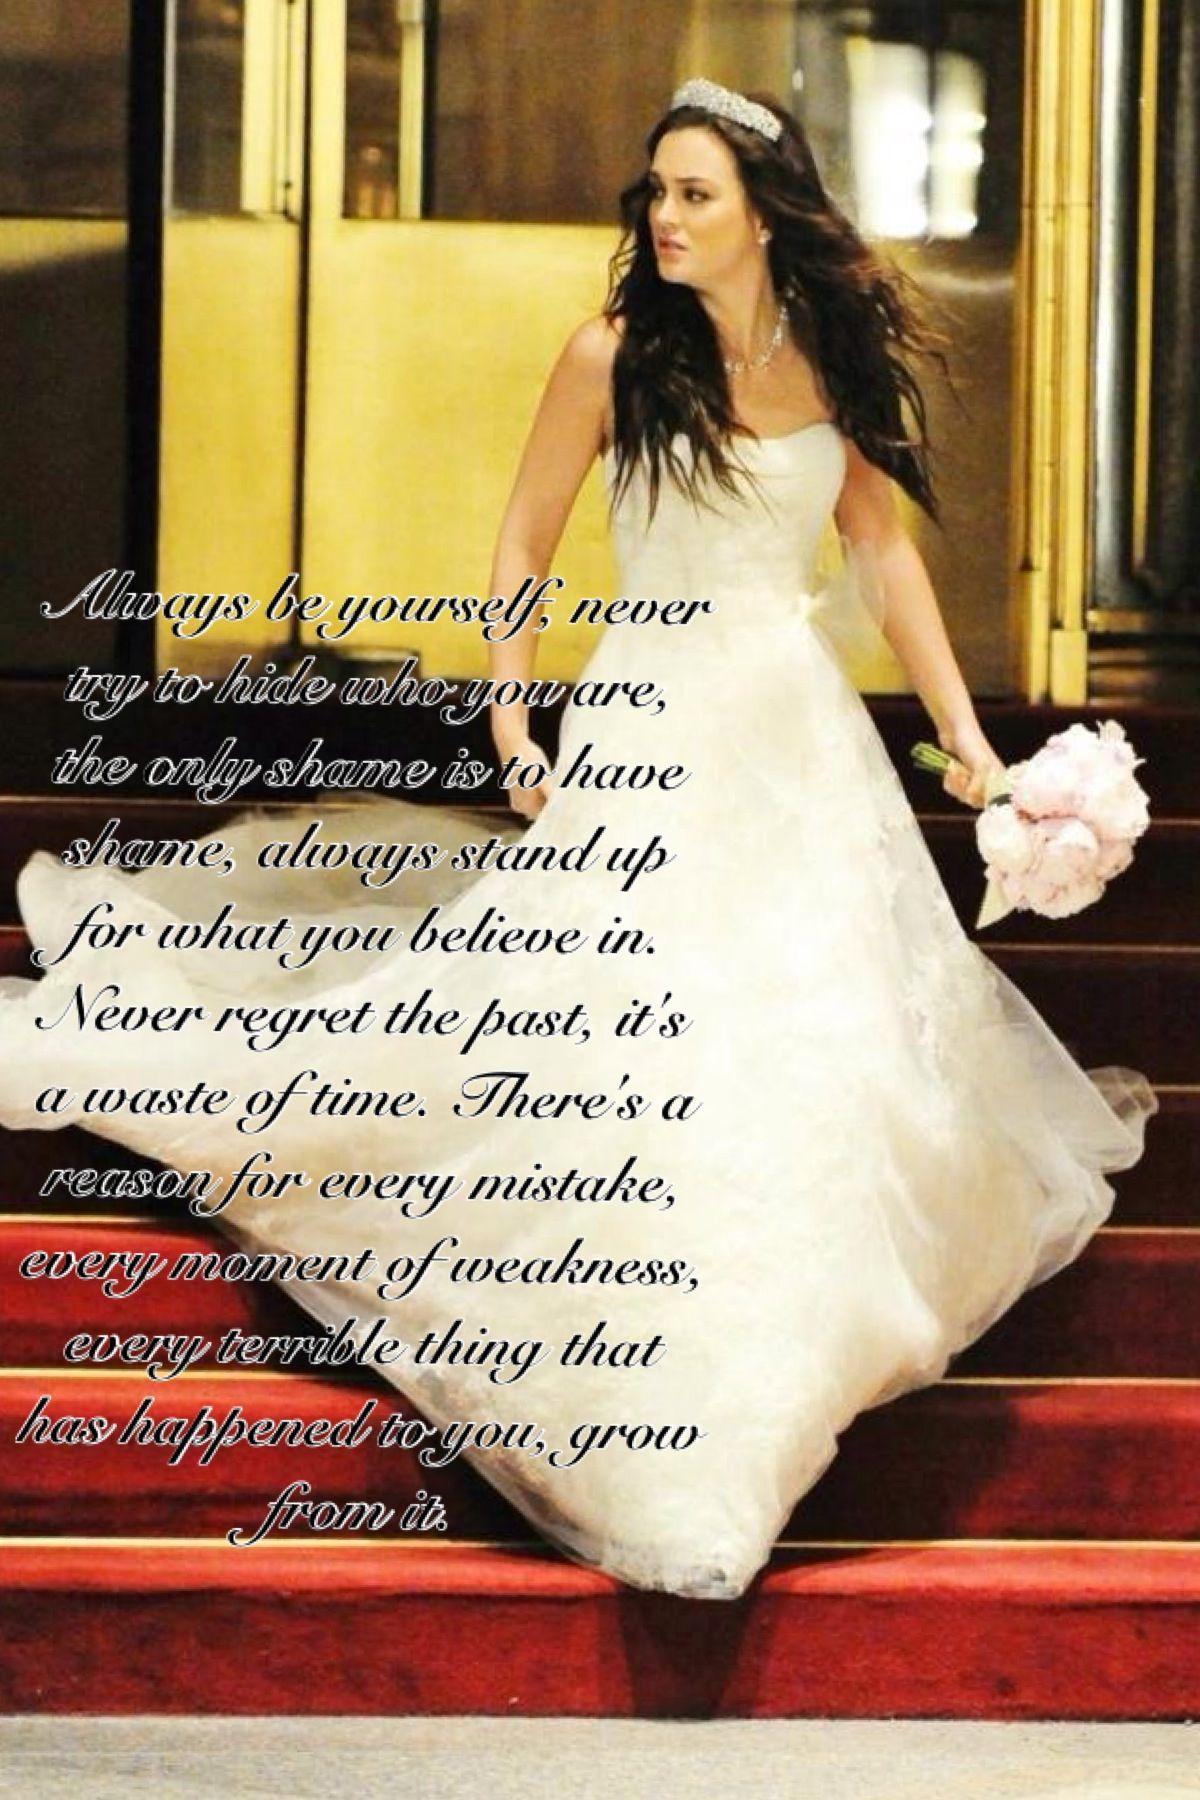 Gg quote gossip girl wedding dresses designer